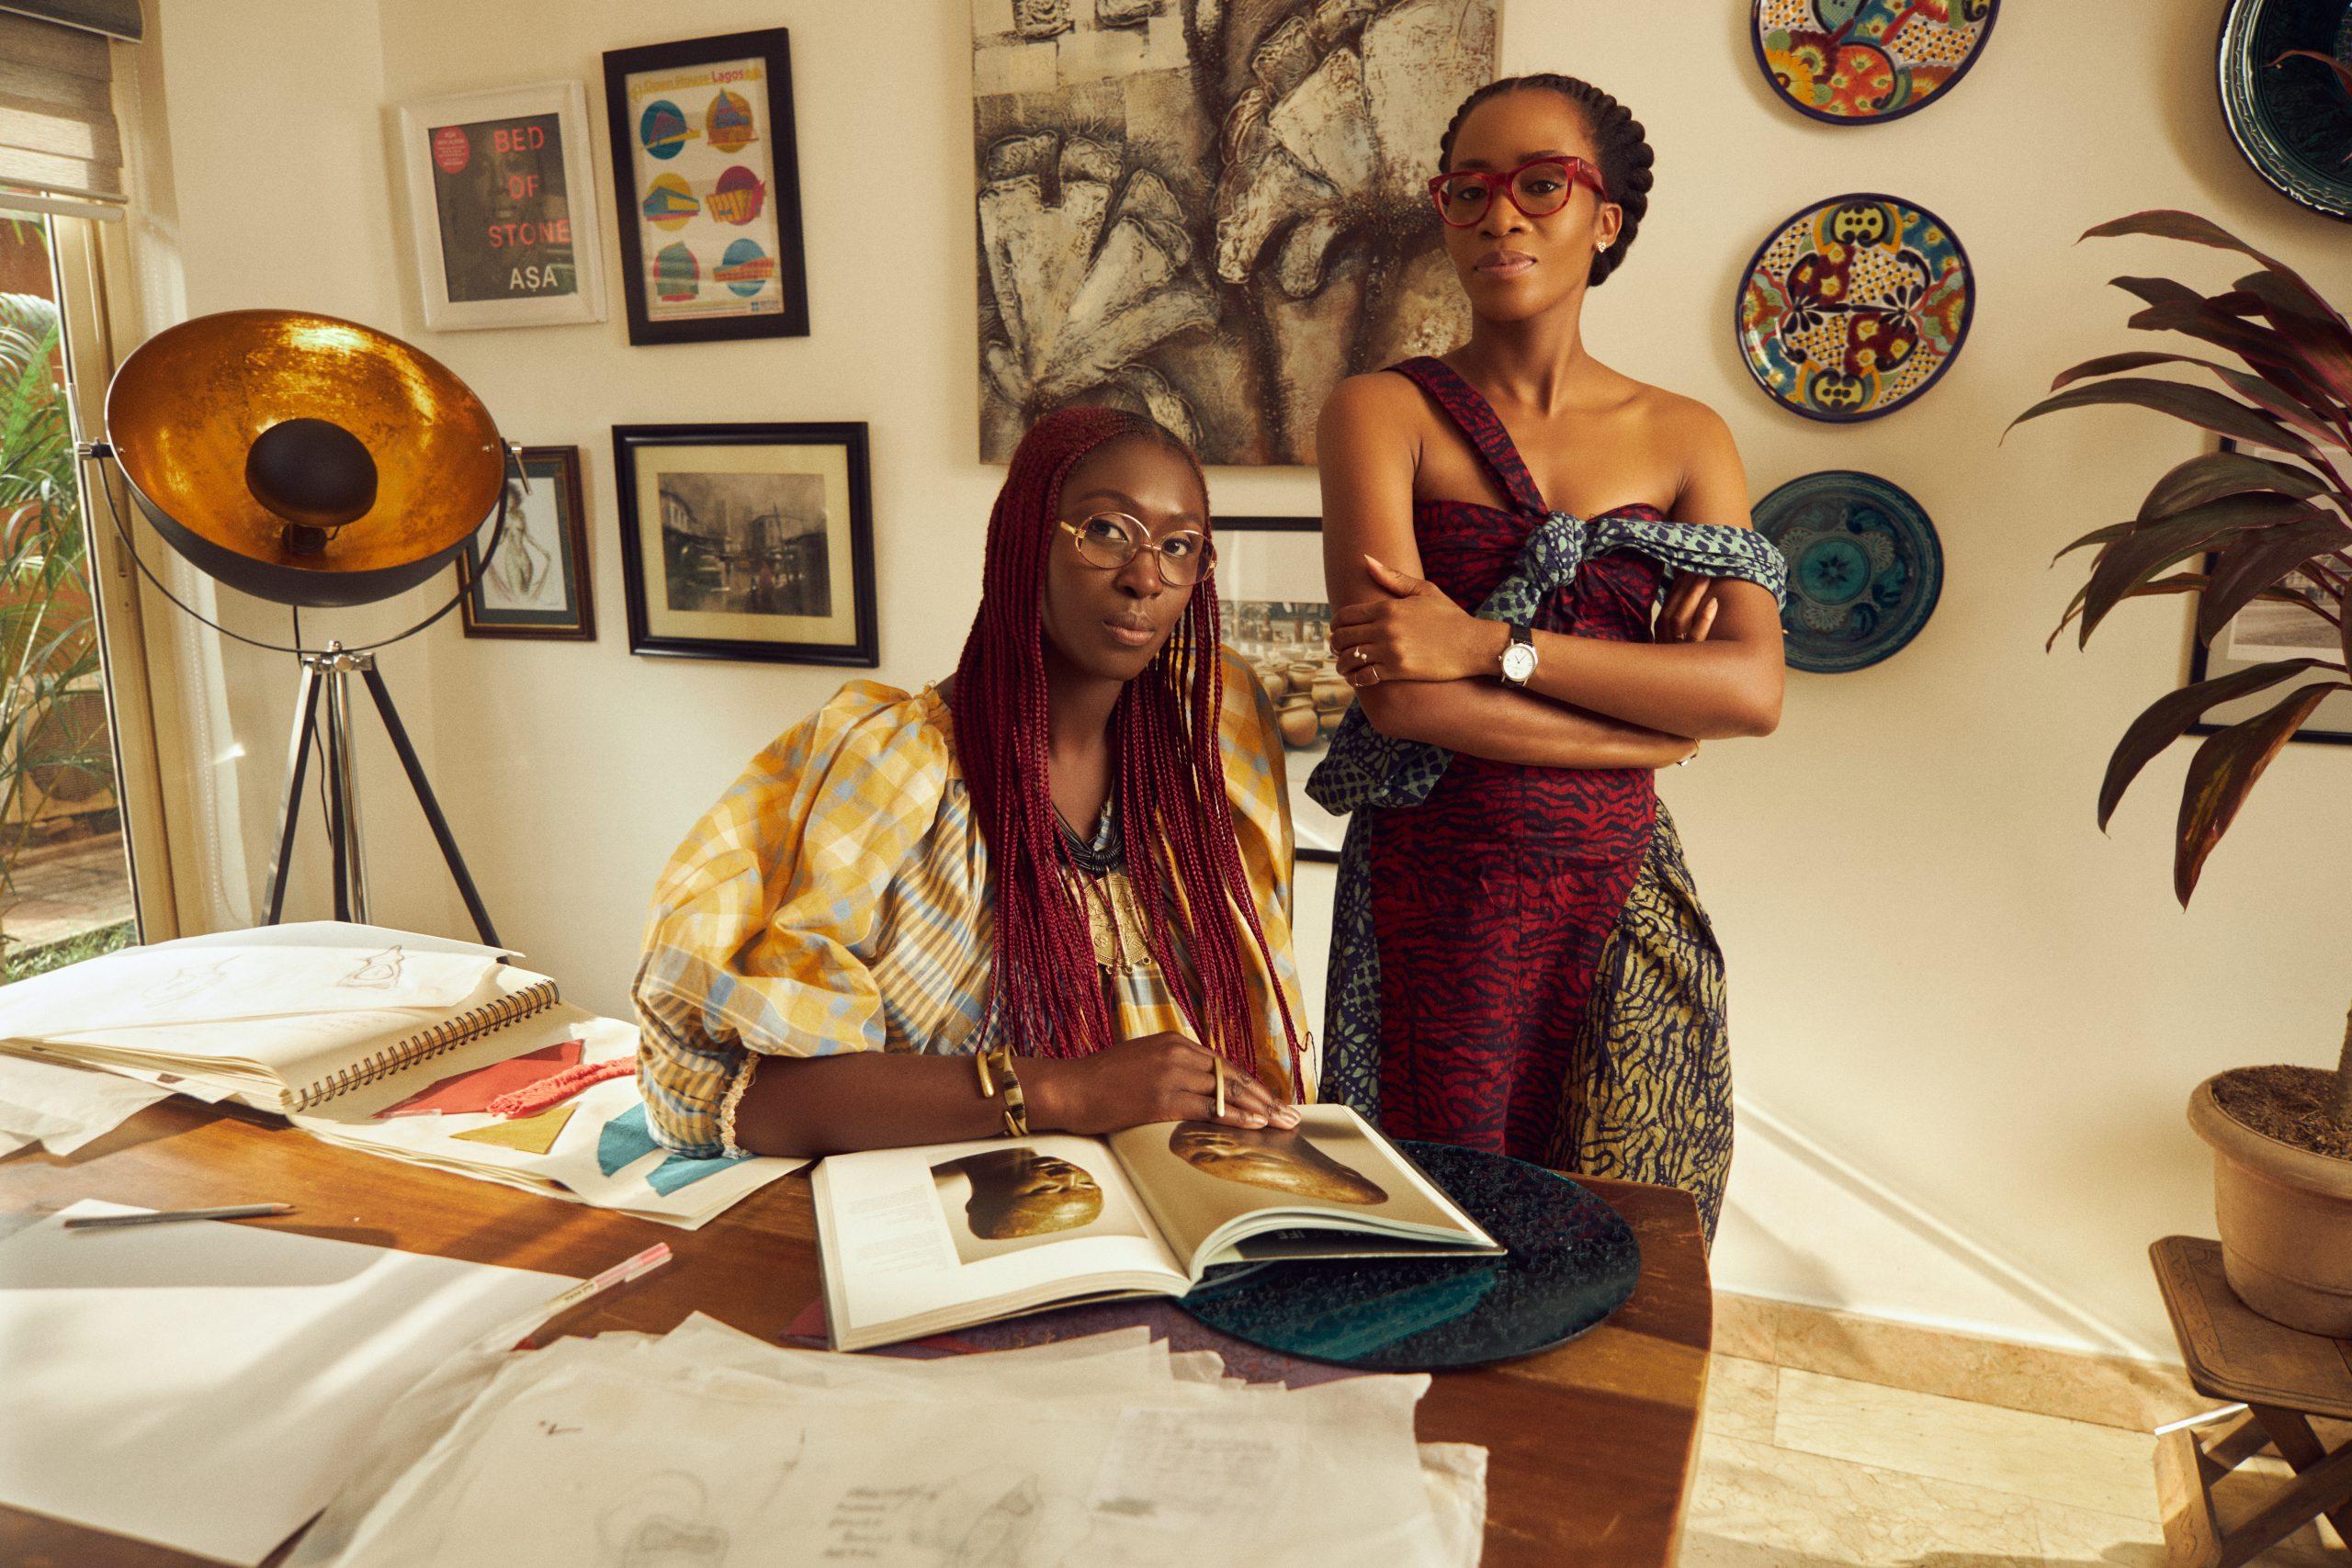 Chrissa Amuah and Tosin Oshinowo at Design Miami/ photo by Spark Creative.